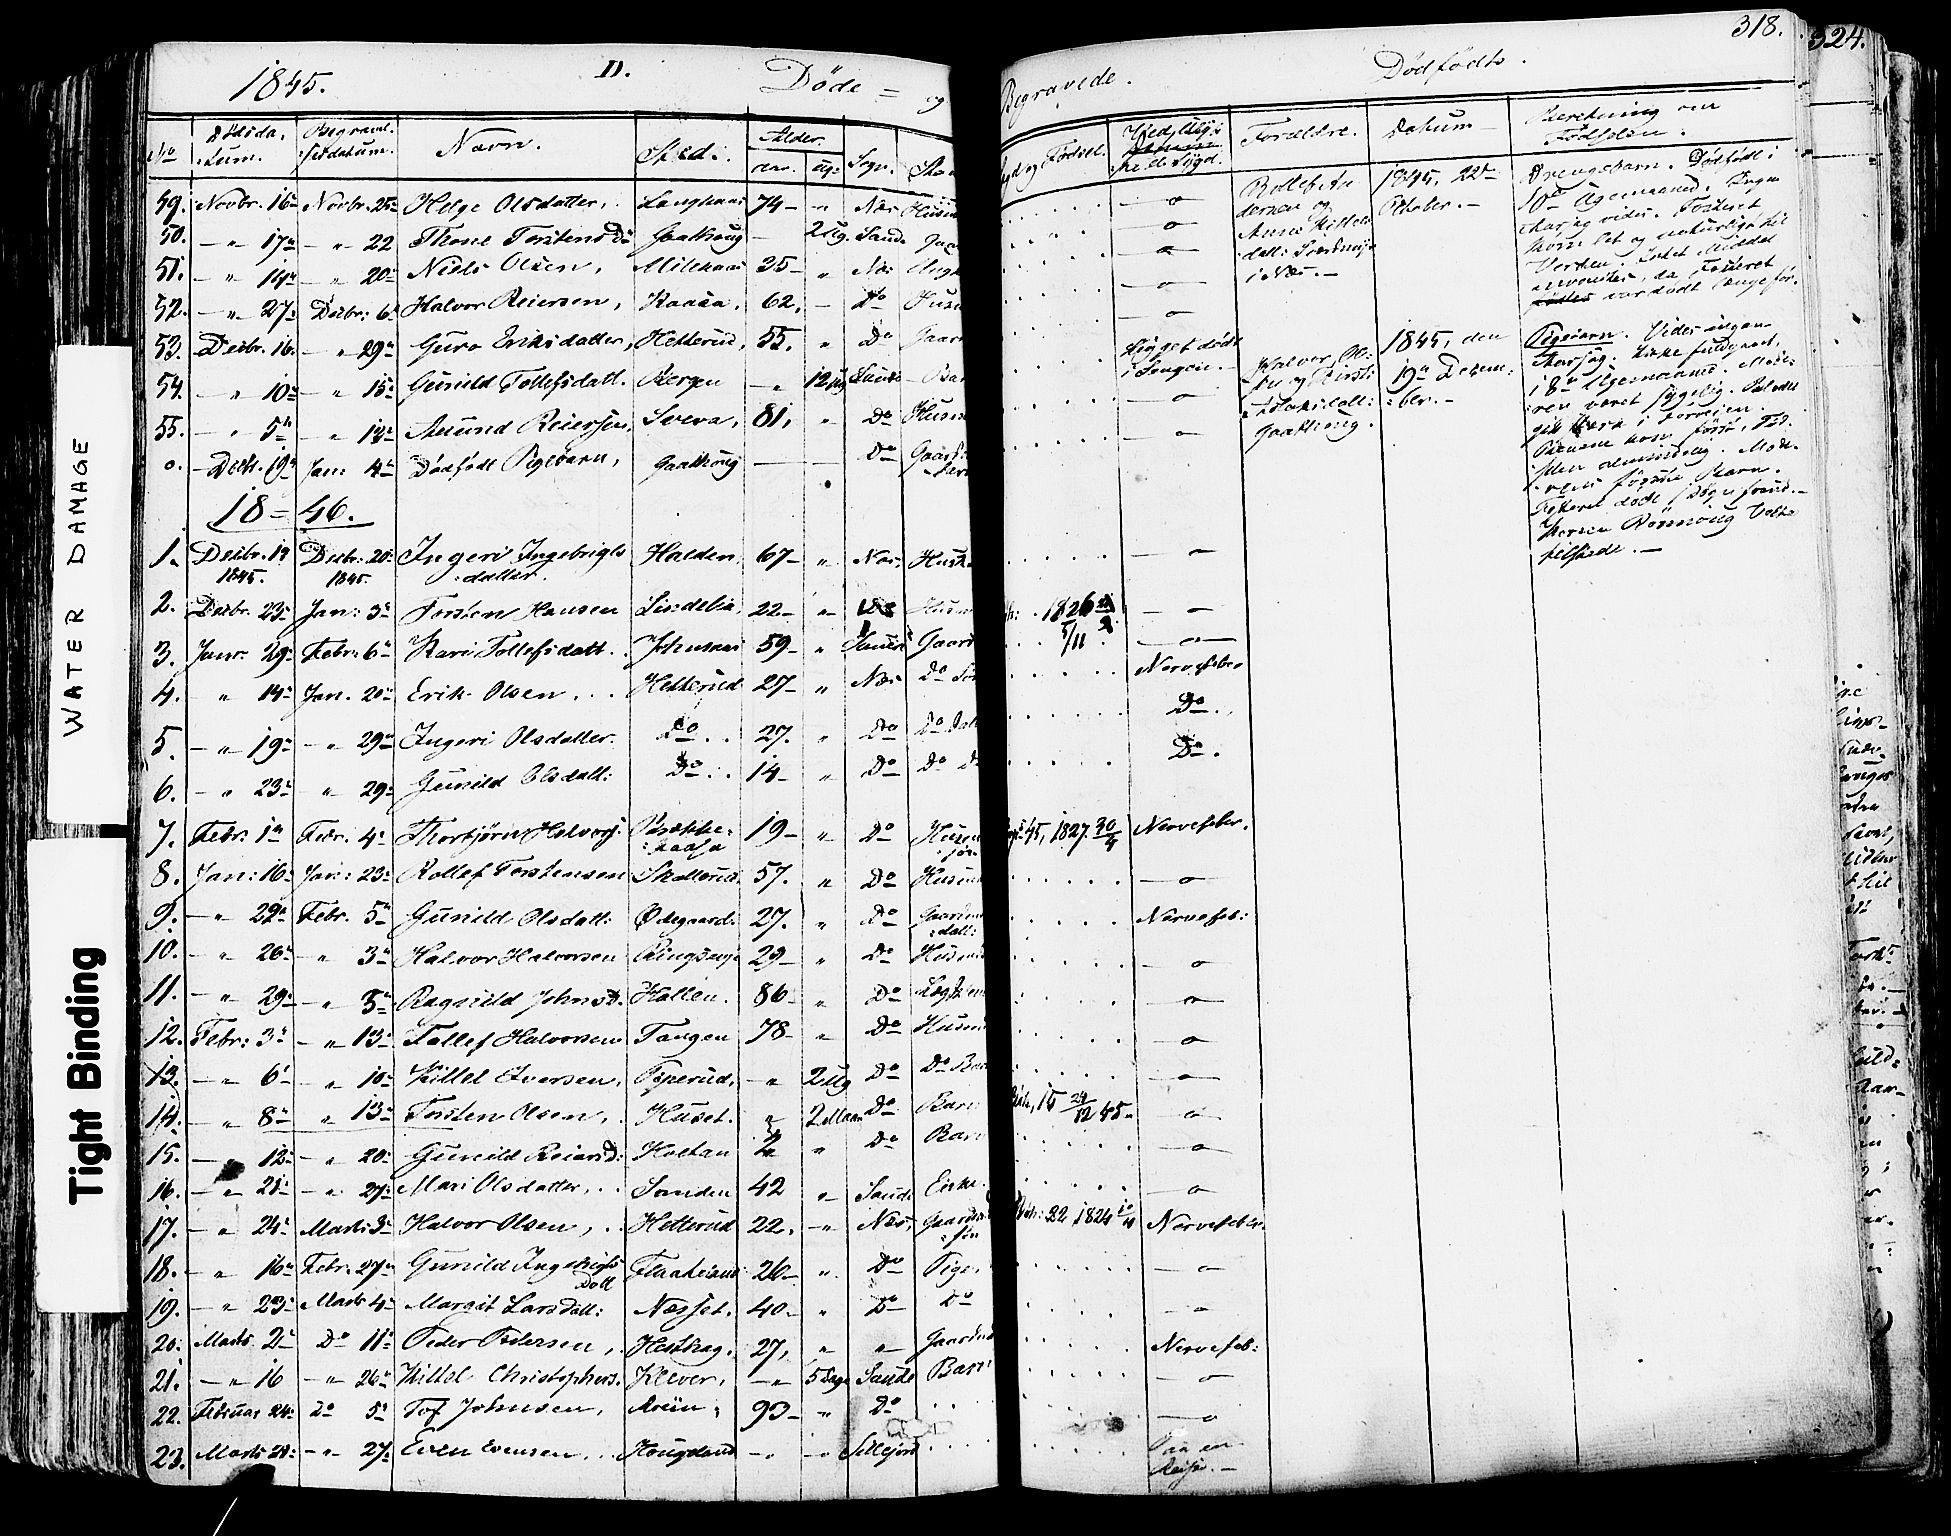 SAKO, Sauherad kirkebøker, F/Fa/L0006: Ministerialbok nr. I 6, 1827-1850, s. 318